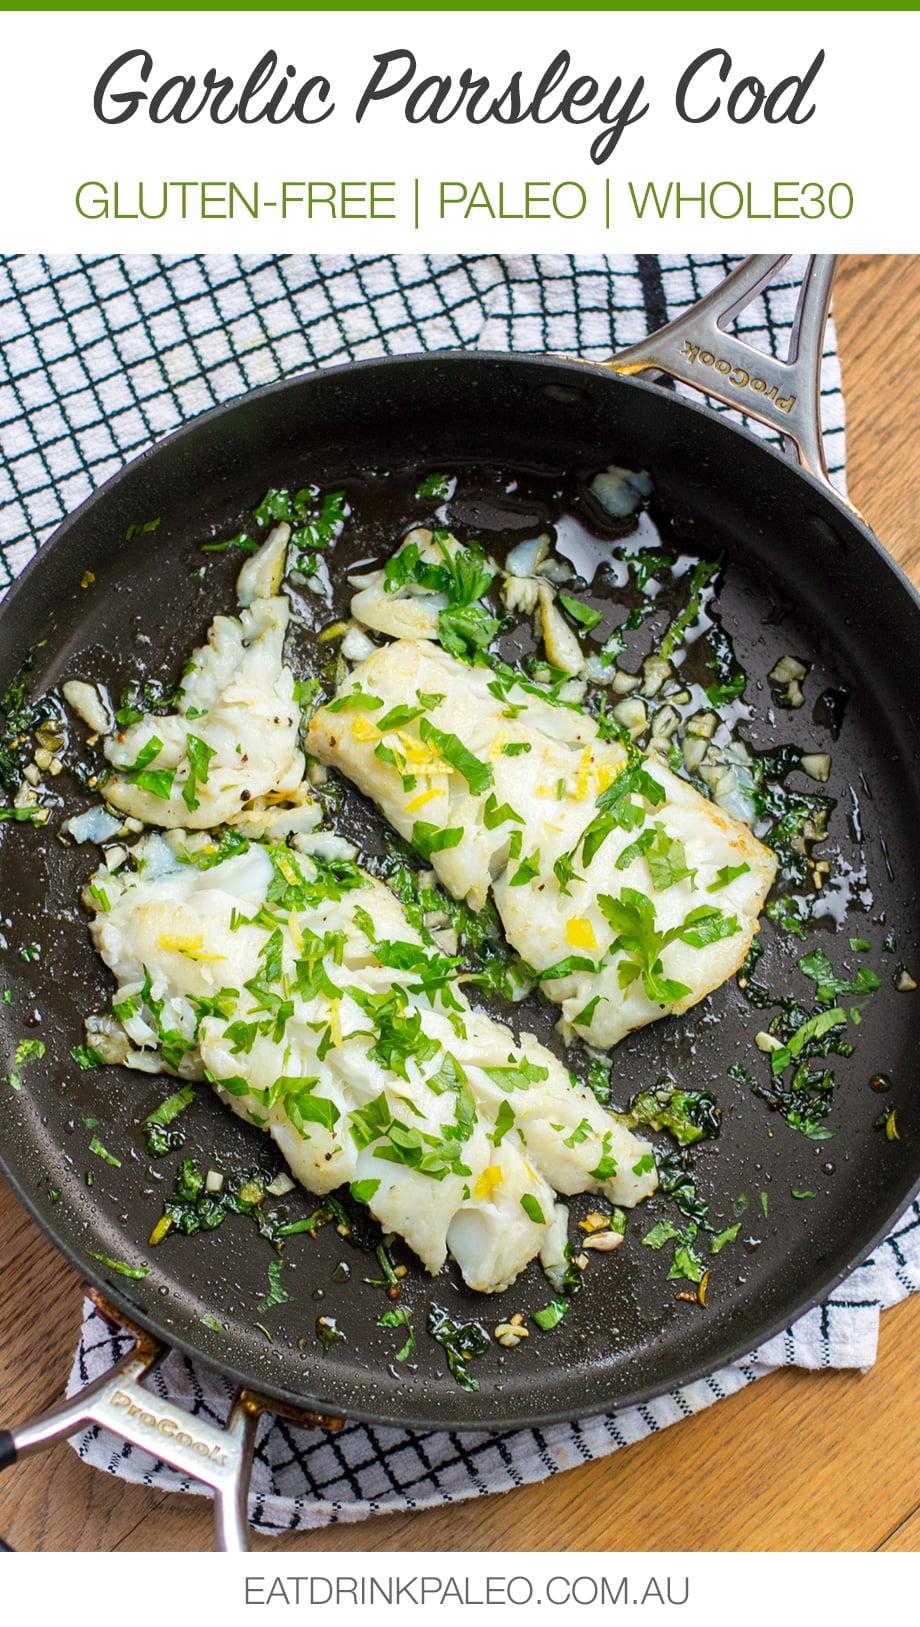 Garlic Parsley Cod Basque Style - Gluten-free, Paleo, Whole30